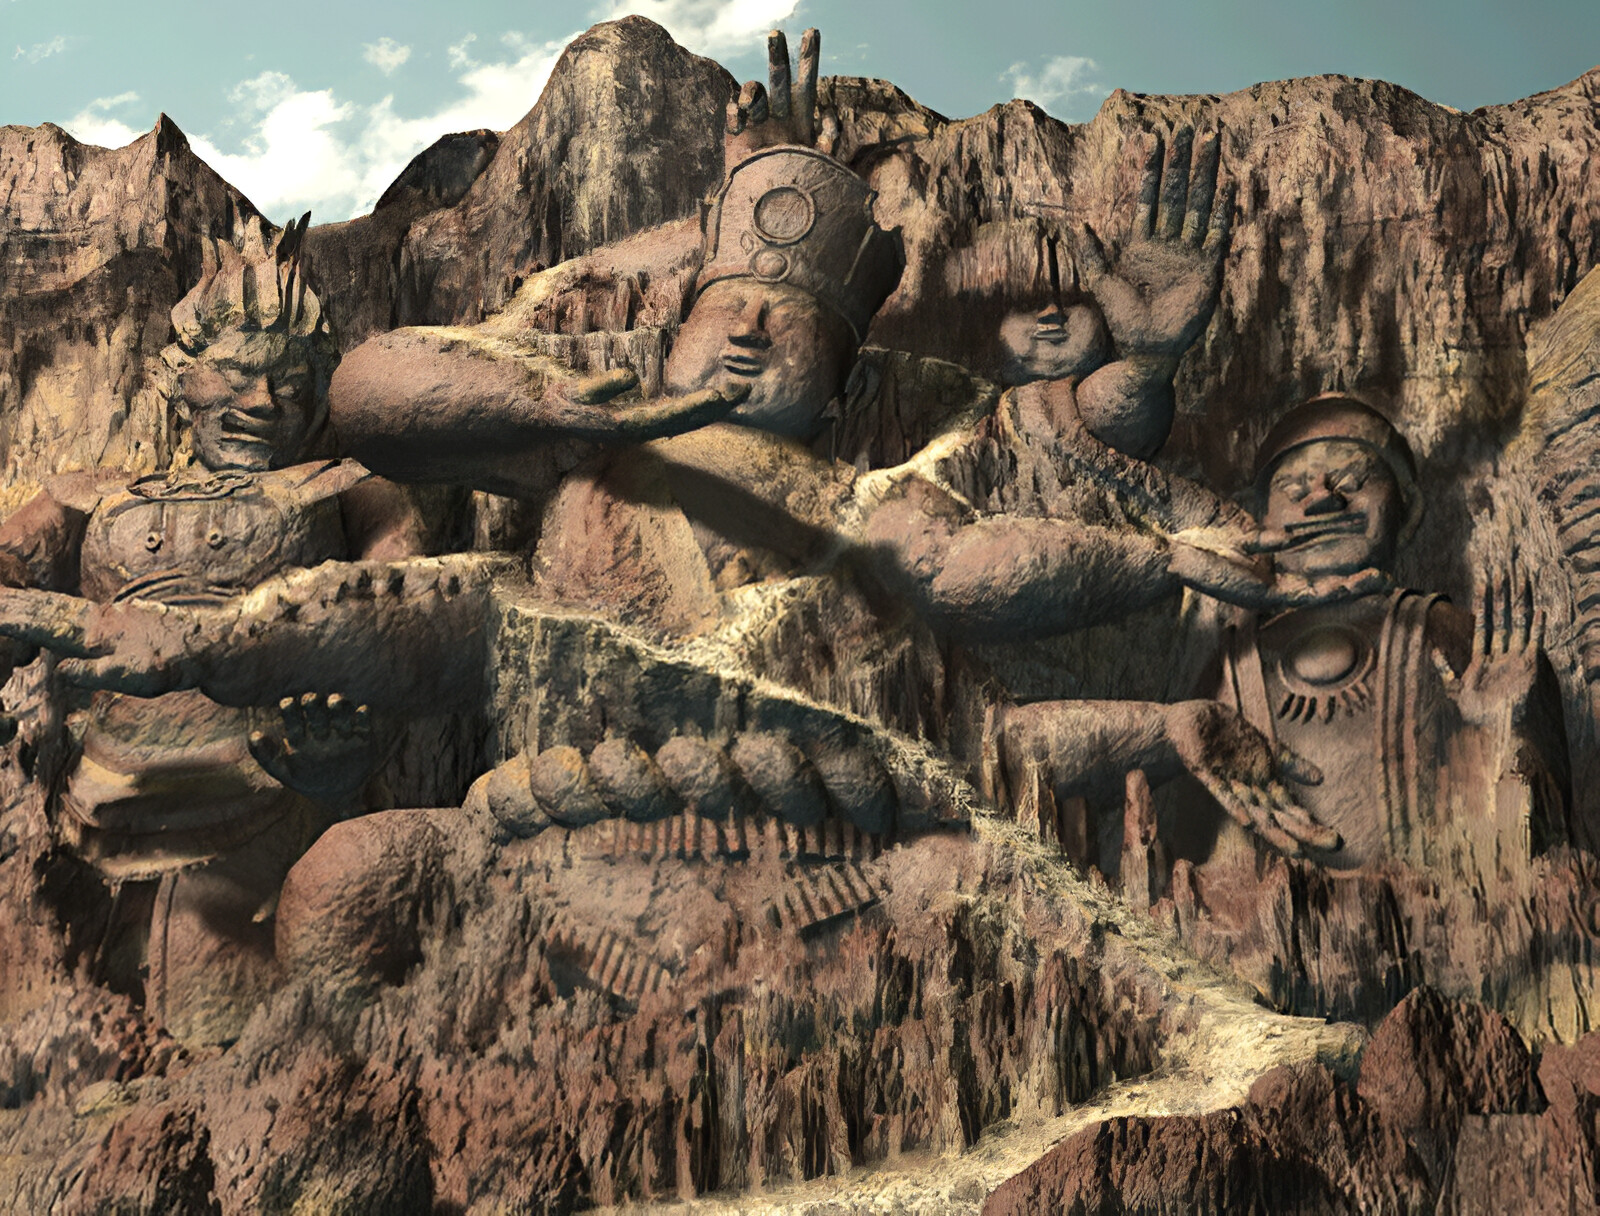 Final Fantasy VII Remako HD Backgrounds Mod Revamps Pre